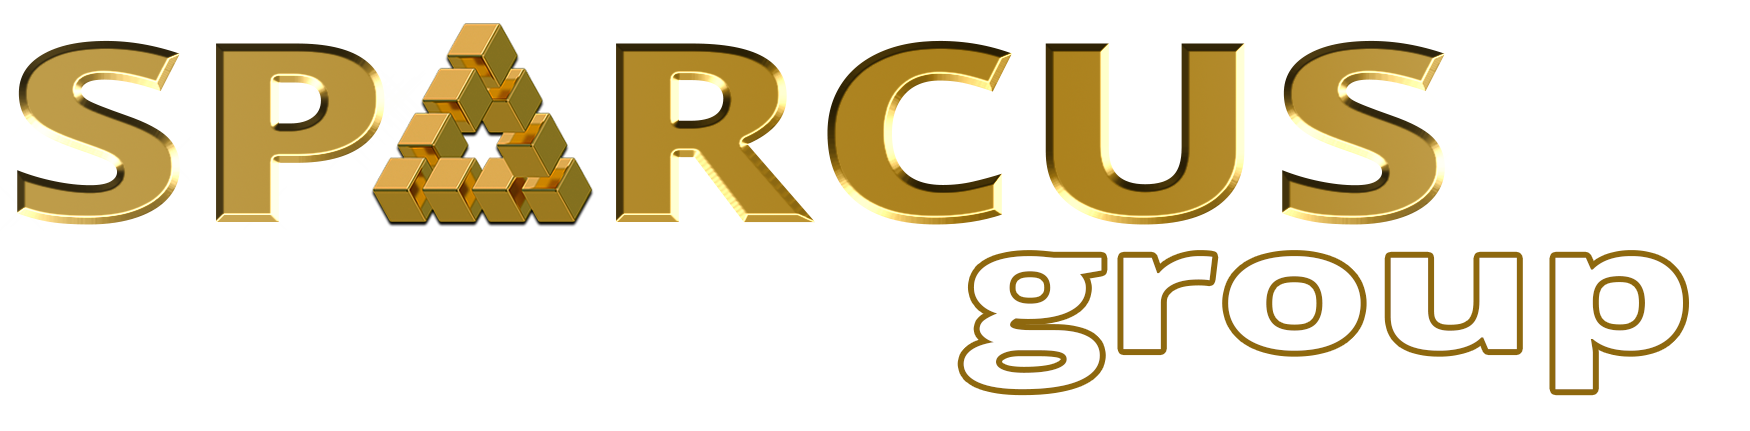 Sparcus Group, a chatbot developer